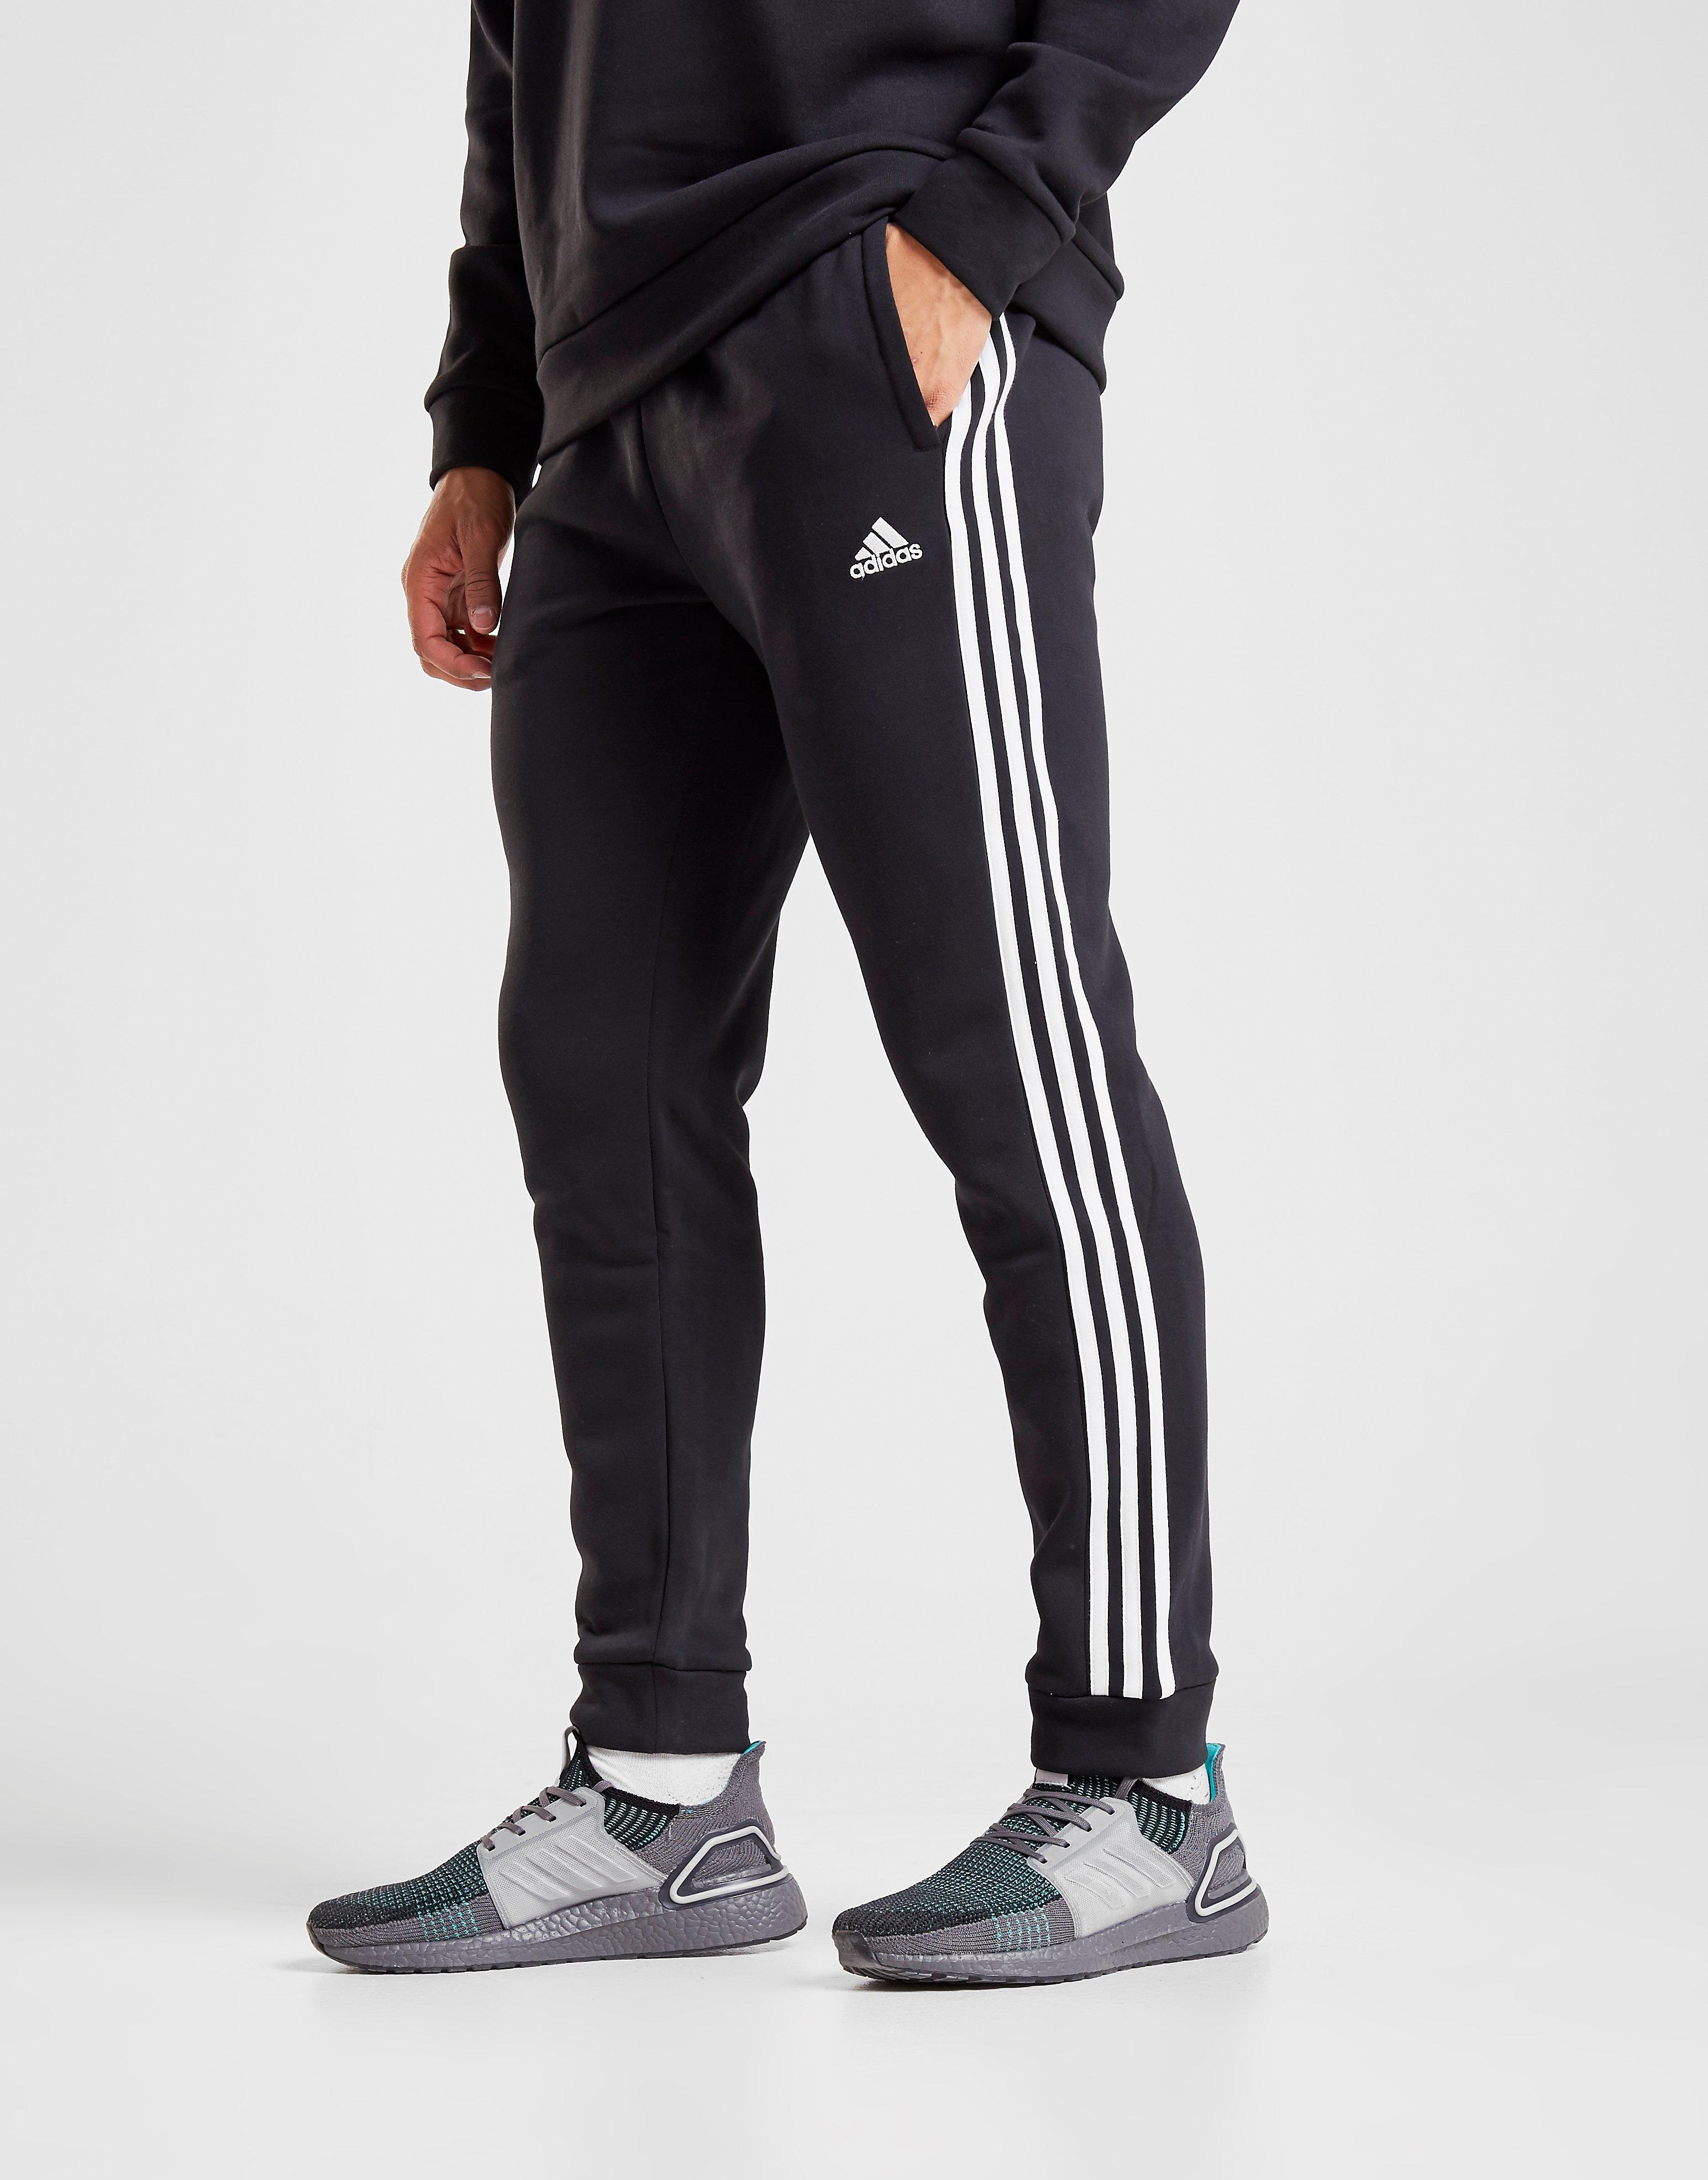 black adidas pants with white stripes